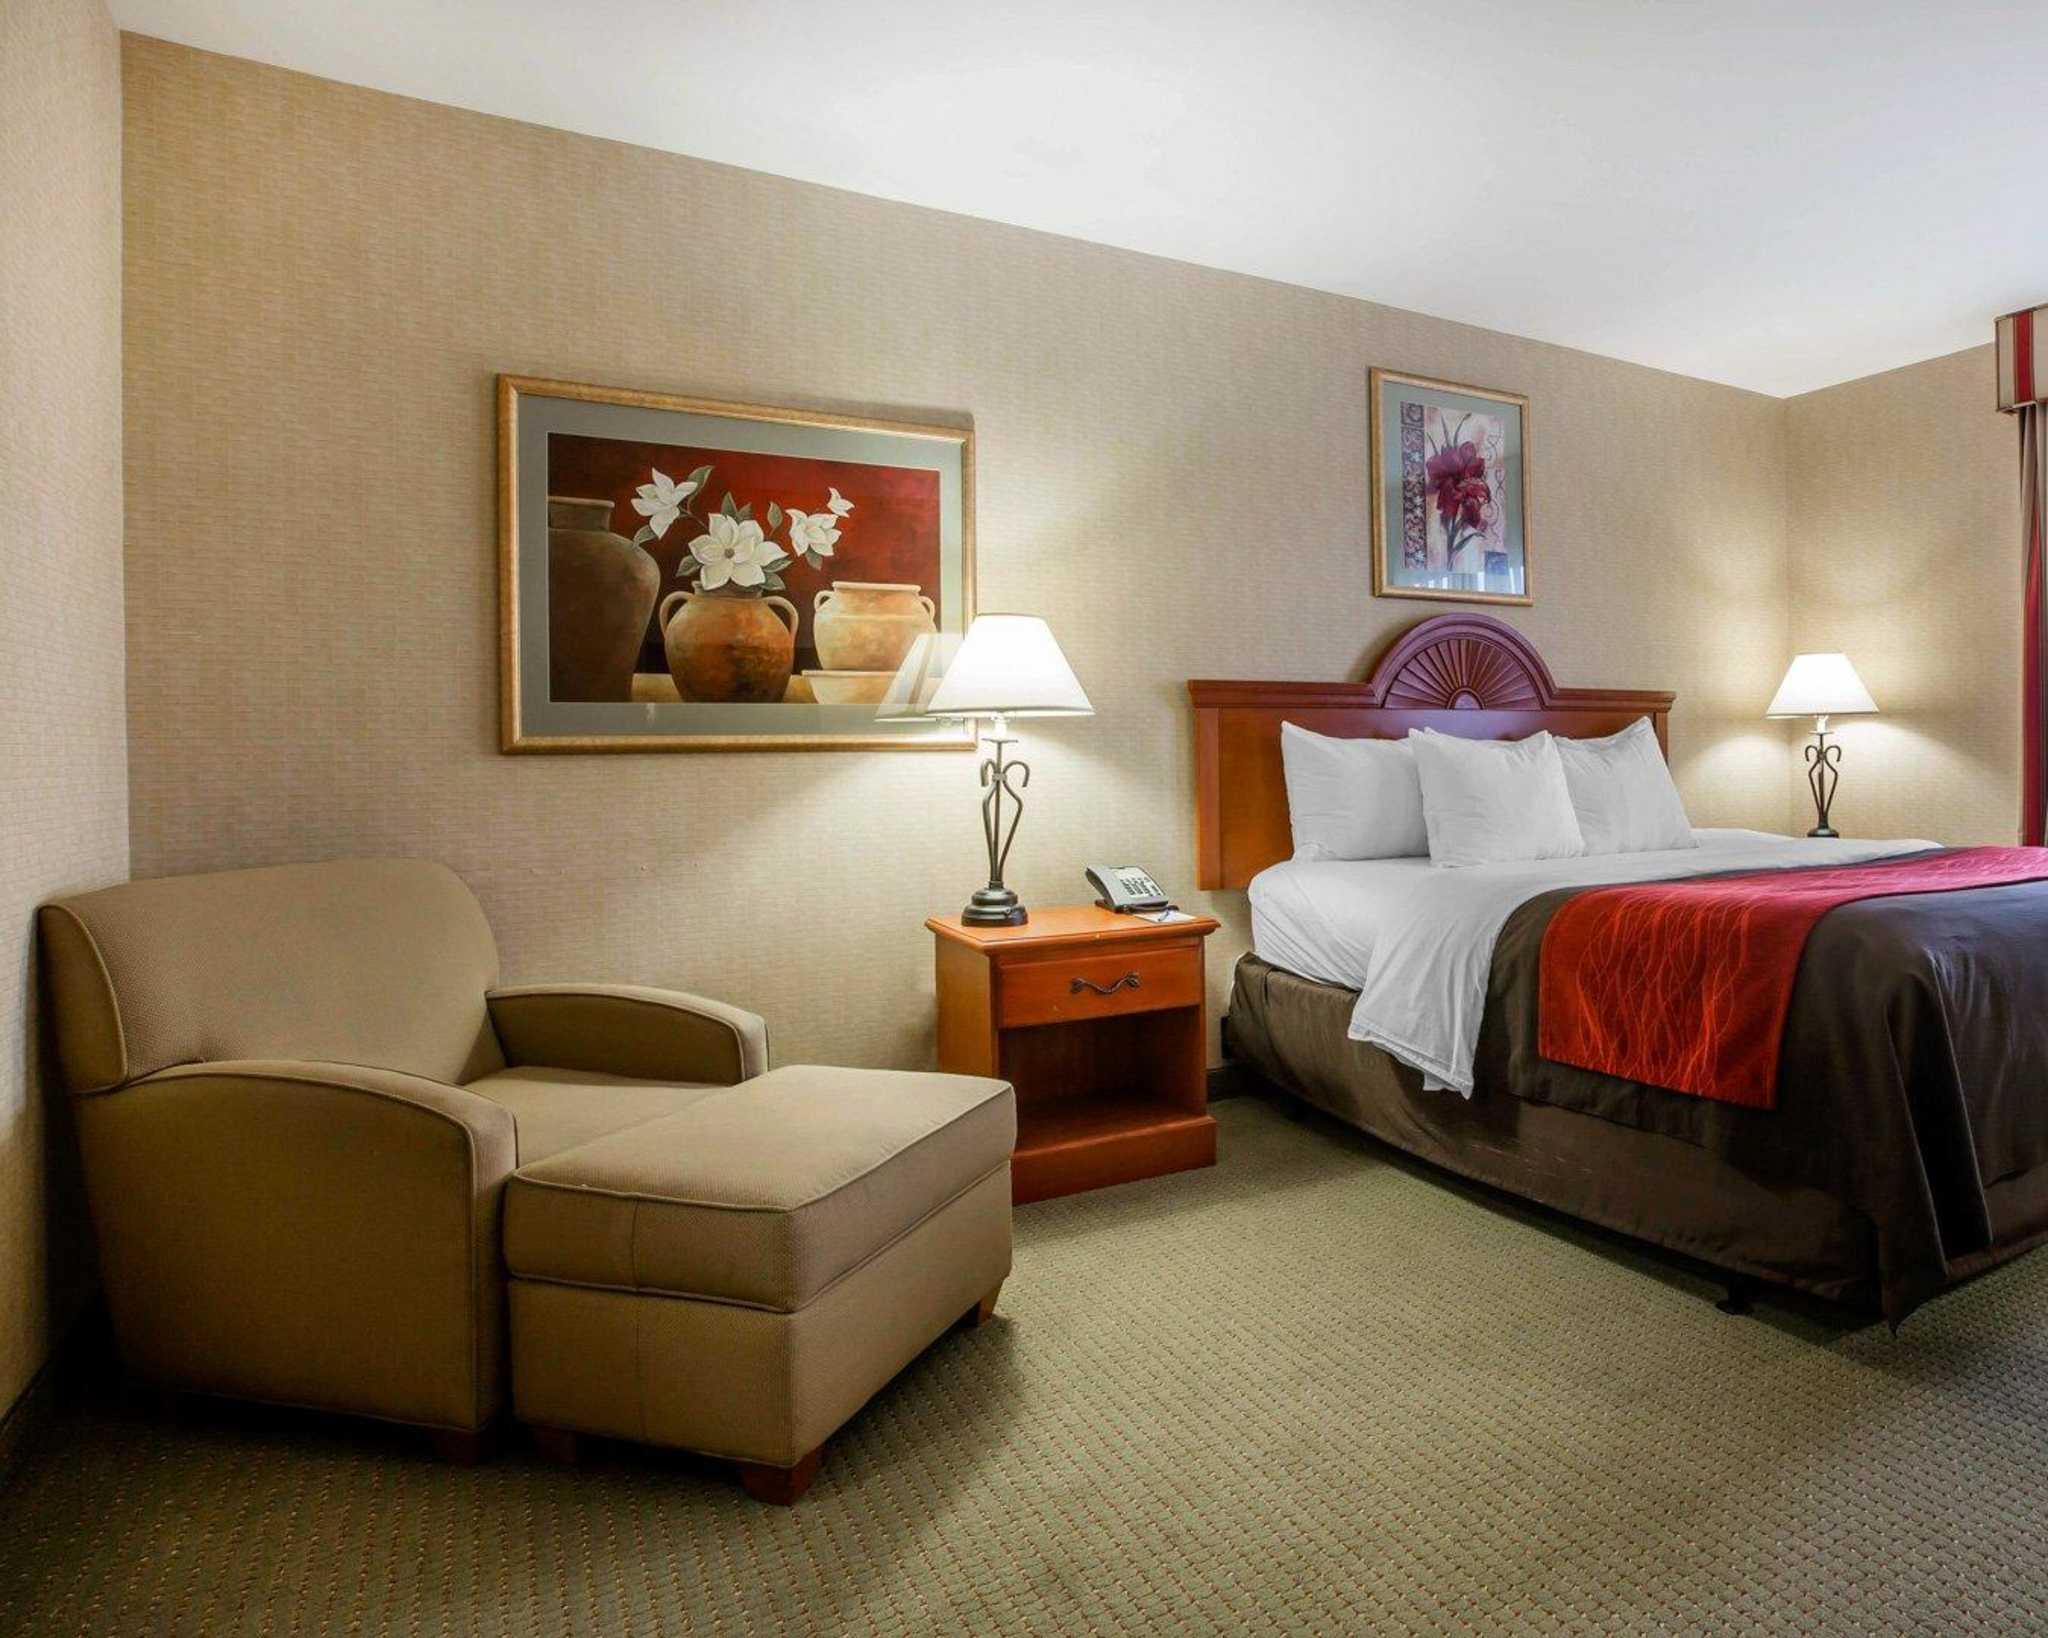 Comfort Inn & Suites adj to Akwesasne Mohawk Casino image 21